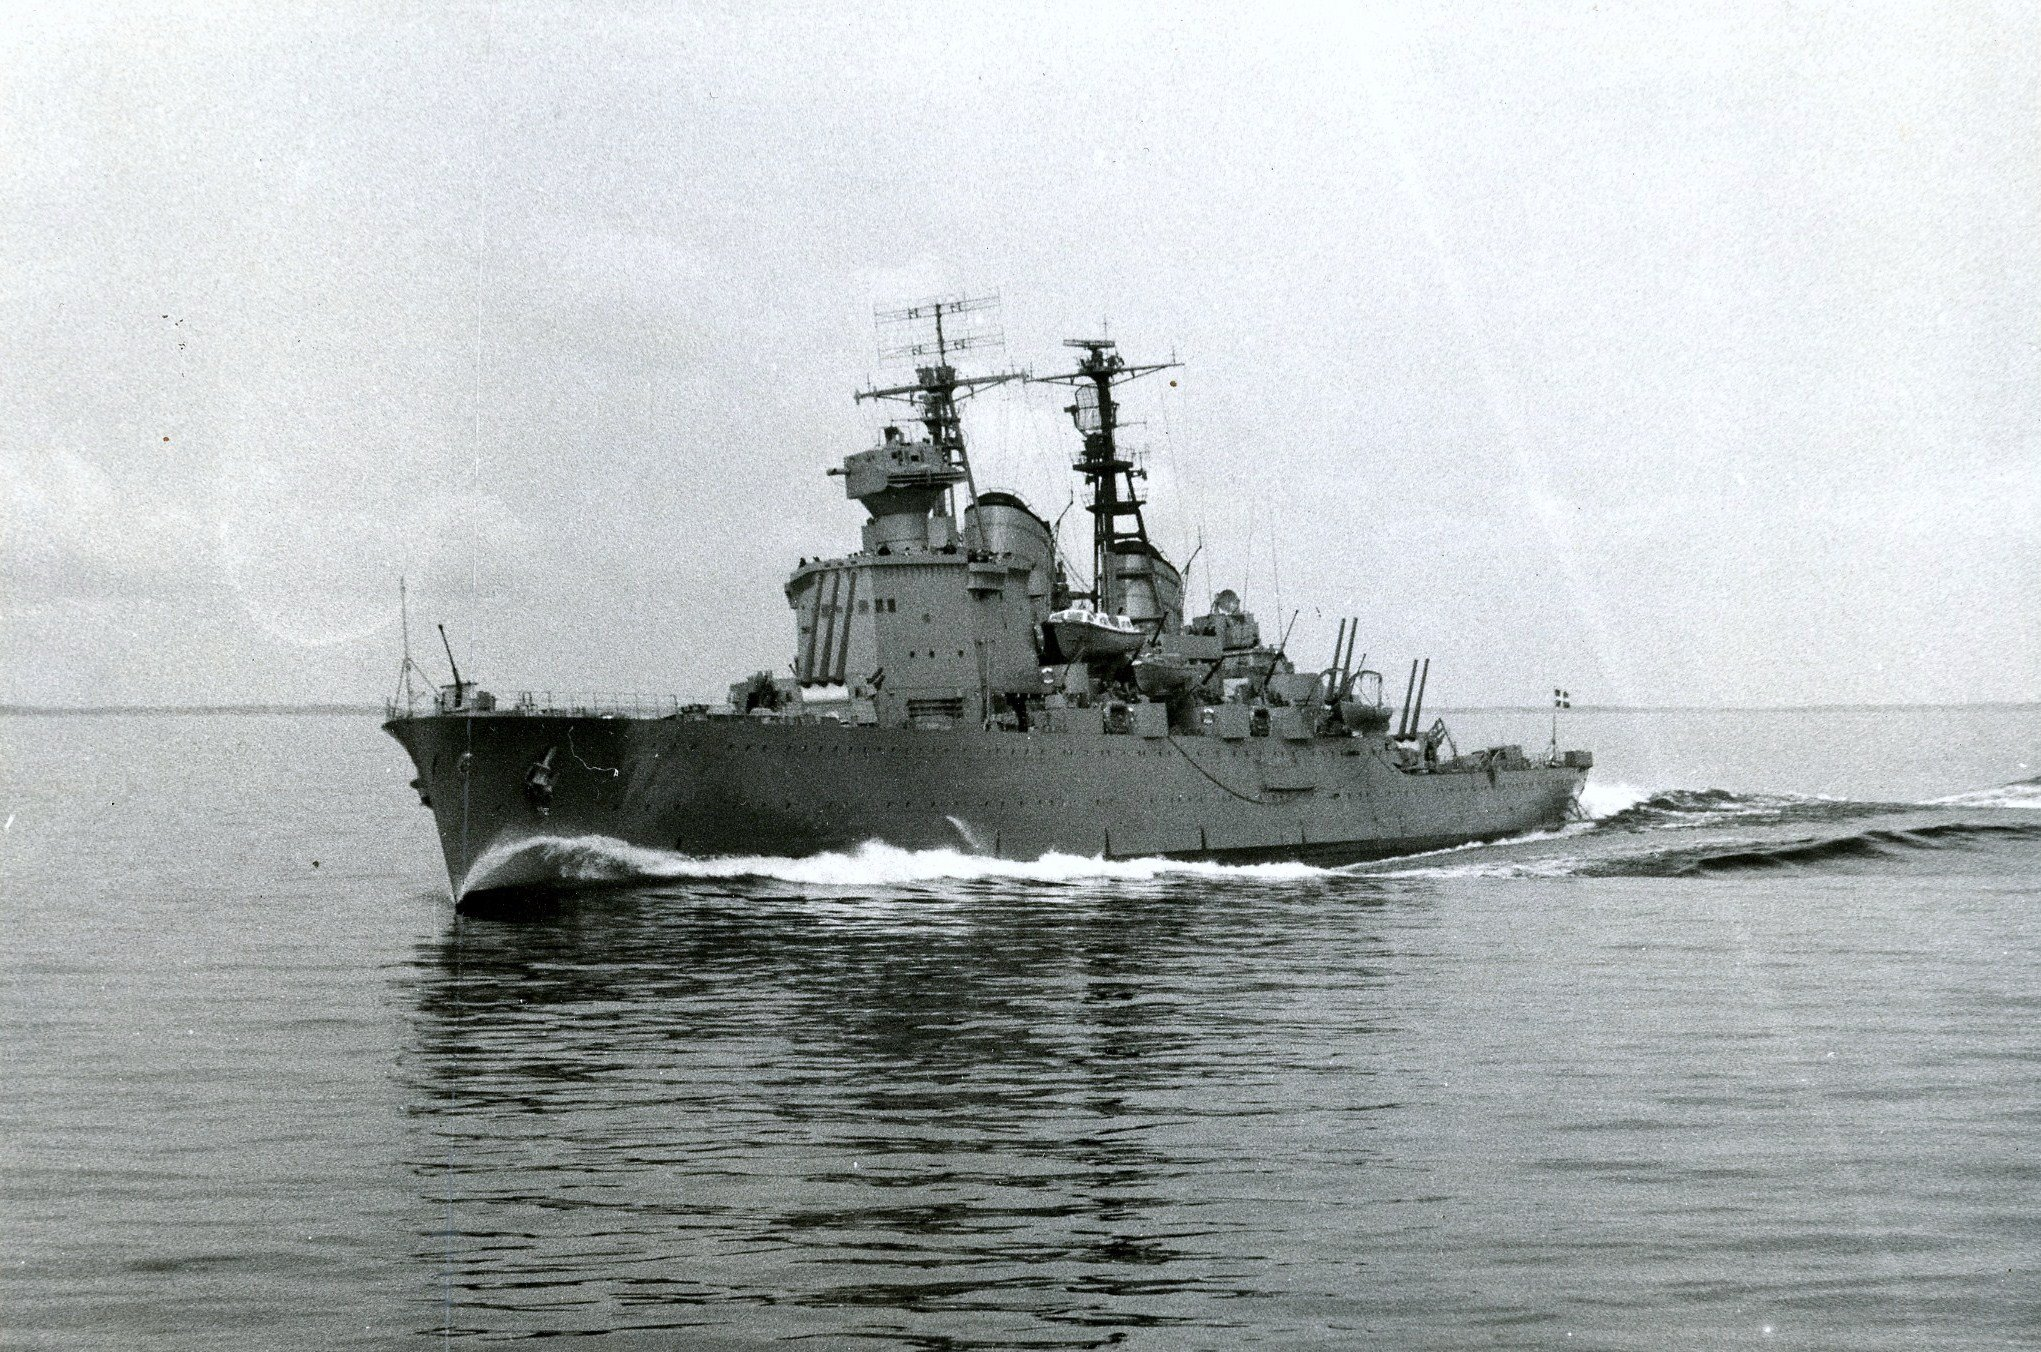 HMS Tre Kronor in 1954.jpg.275f42d2cd75c649506e74e7e40d1673 - LINE PROPOSAL: Pan-European Light Cruisers.